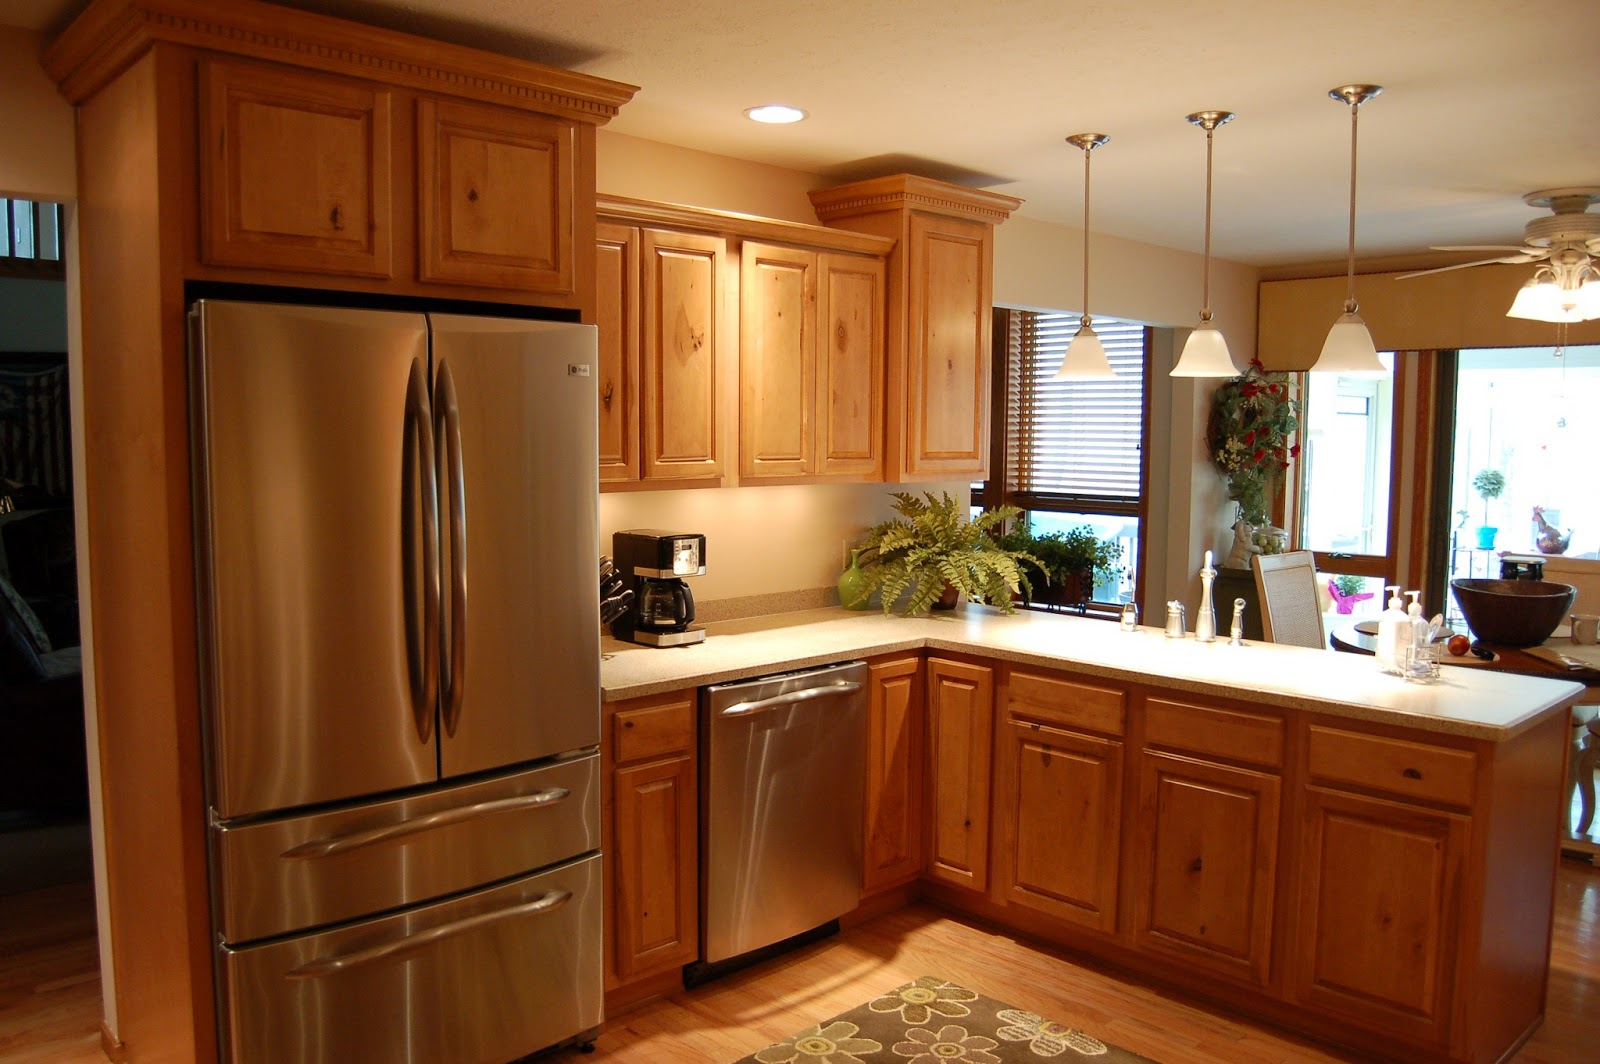 Sweetlake Interior Design LLC Interior Decorator Houston Texas For Modern  Sleek Look Kitchen With Natural Wooden